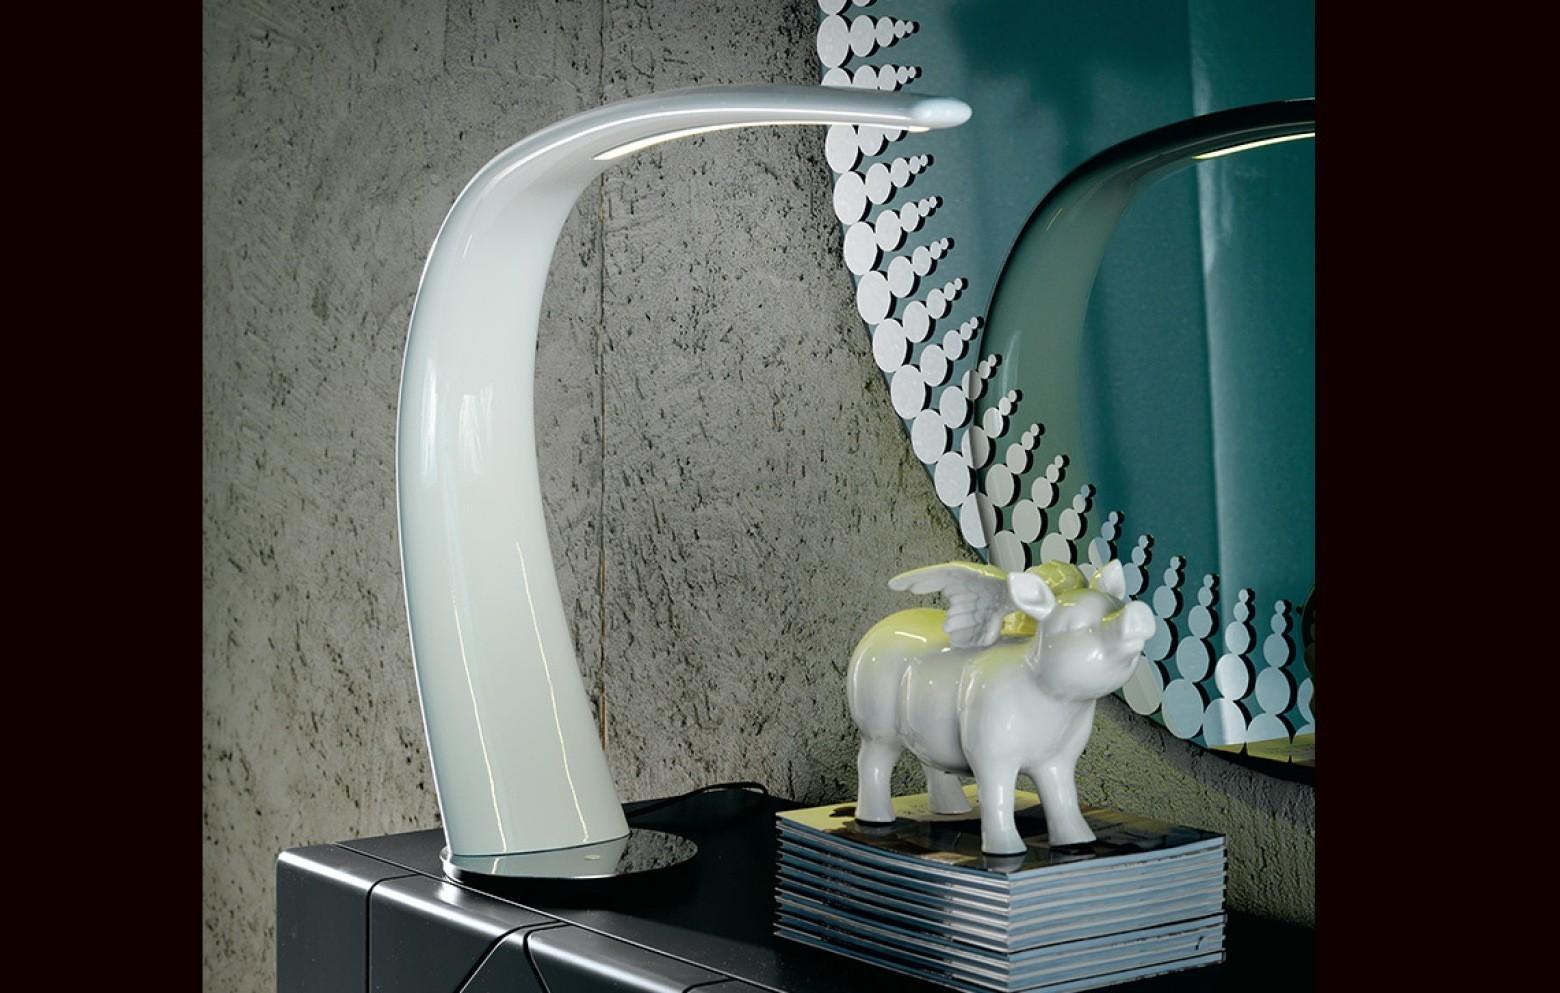 mamba tischleuchte lampen kleinm bel accessoires who 39 s perfect. Black Bedroom Furniture Sets. Home Design Ideas